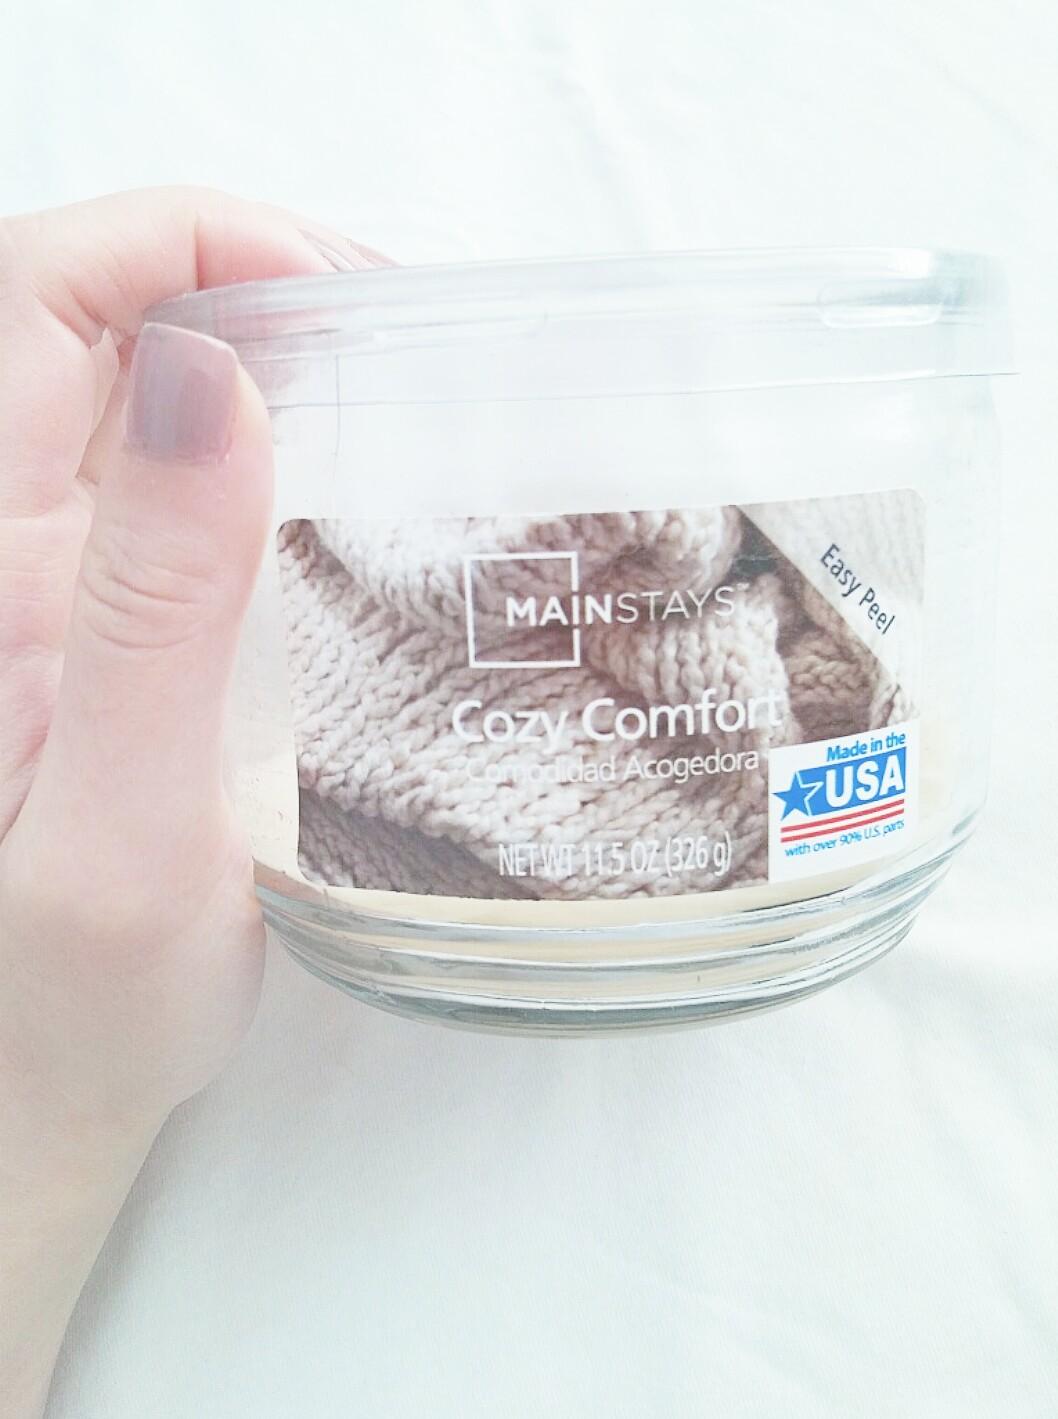 Walmart Mainstay Cozy Comfort Candle